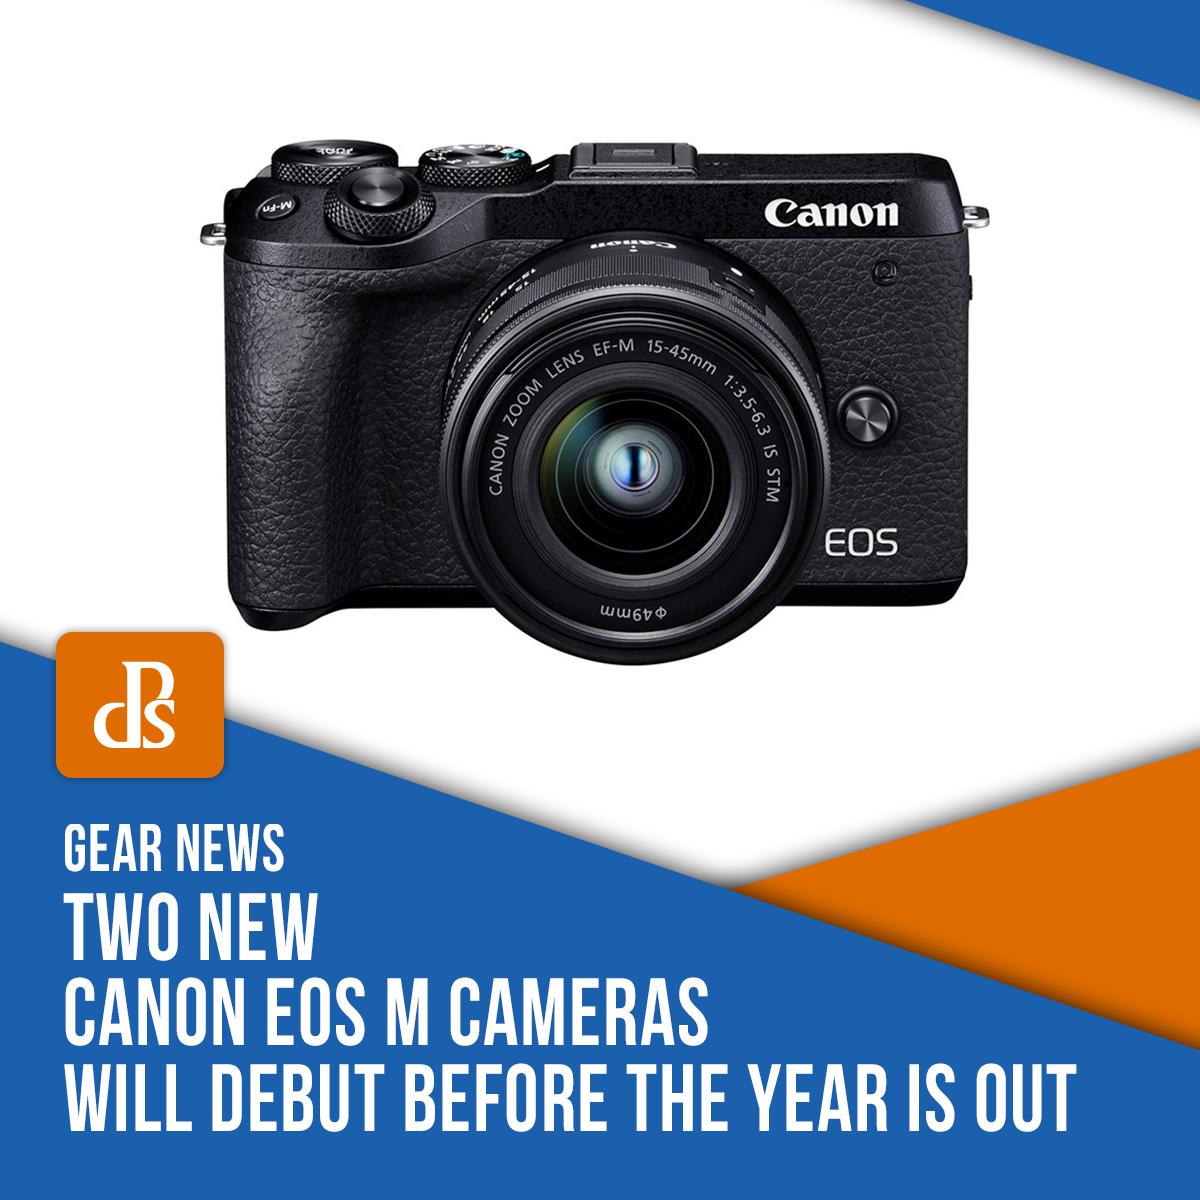 Gear News - New Canon EOS M Cameras